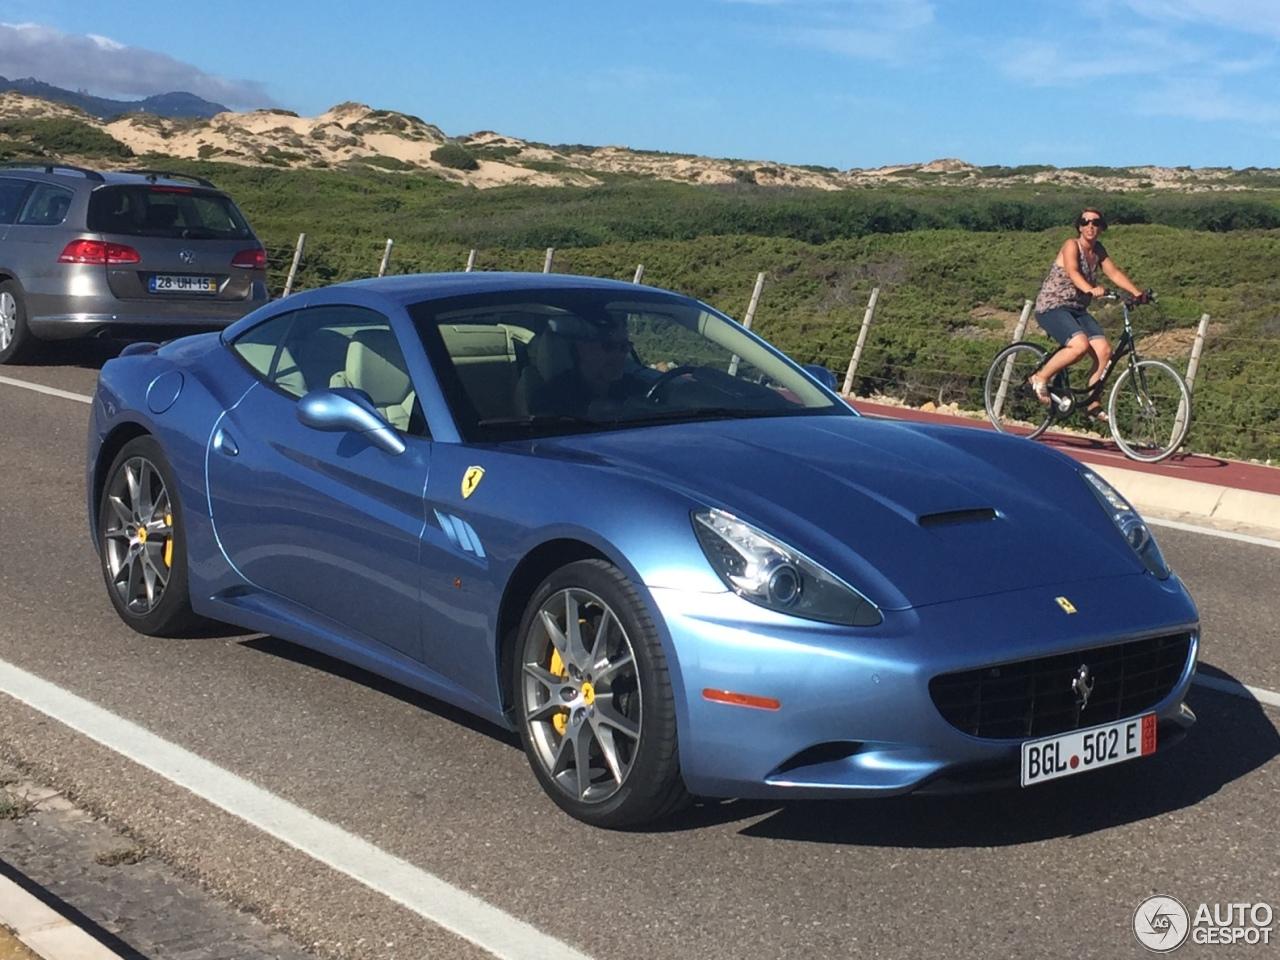 Ferrari California - 8 July 2018 - Autogespot